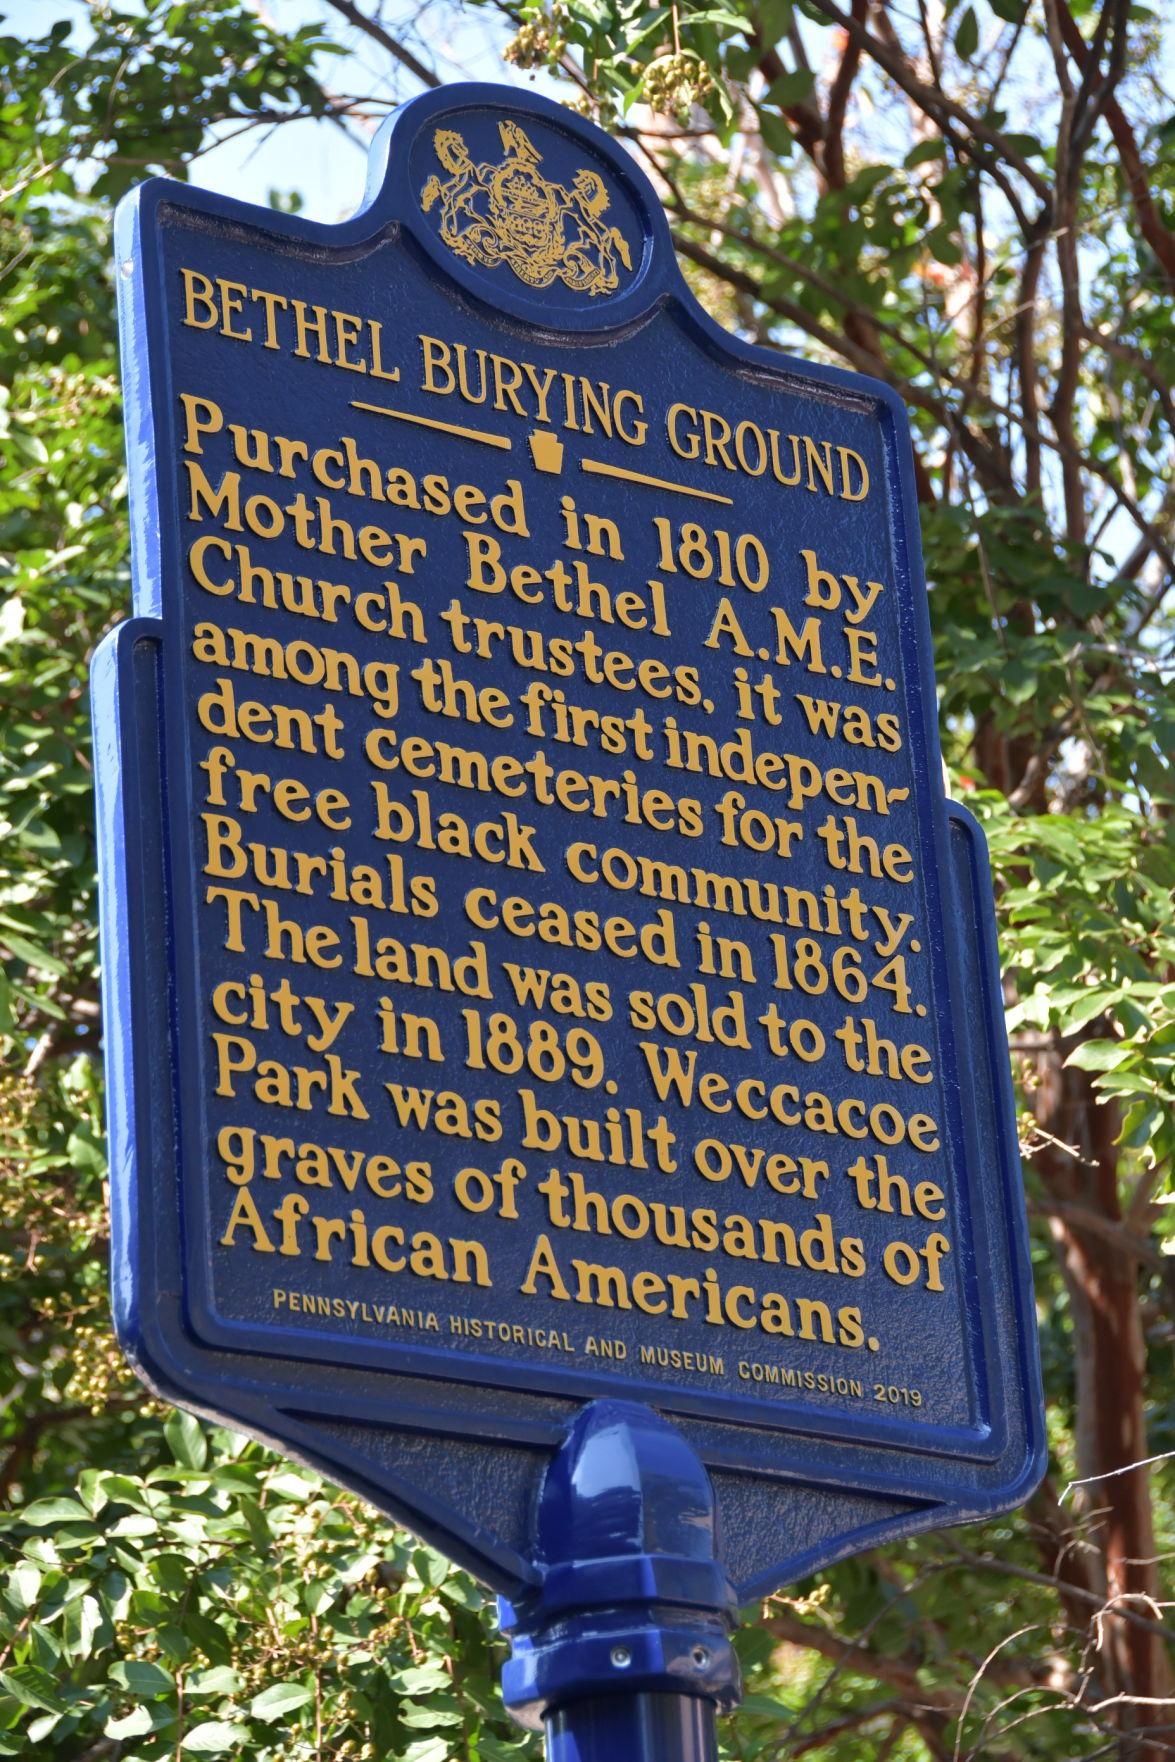 Bethel Burying Ground marker